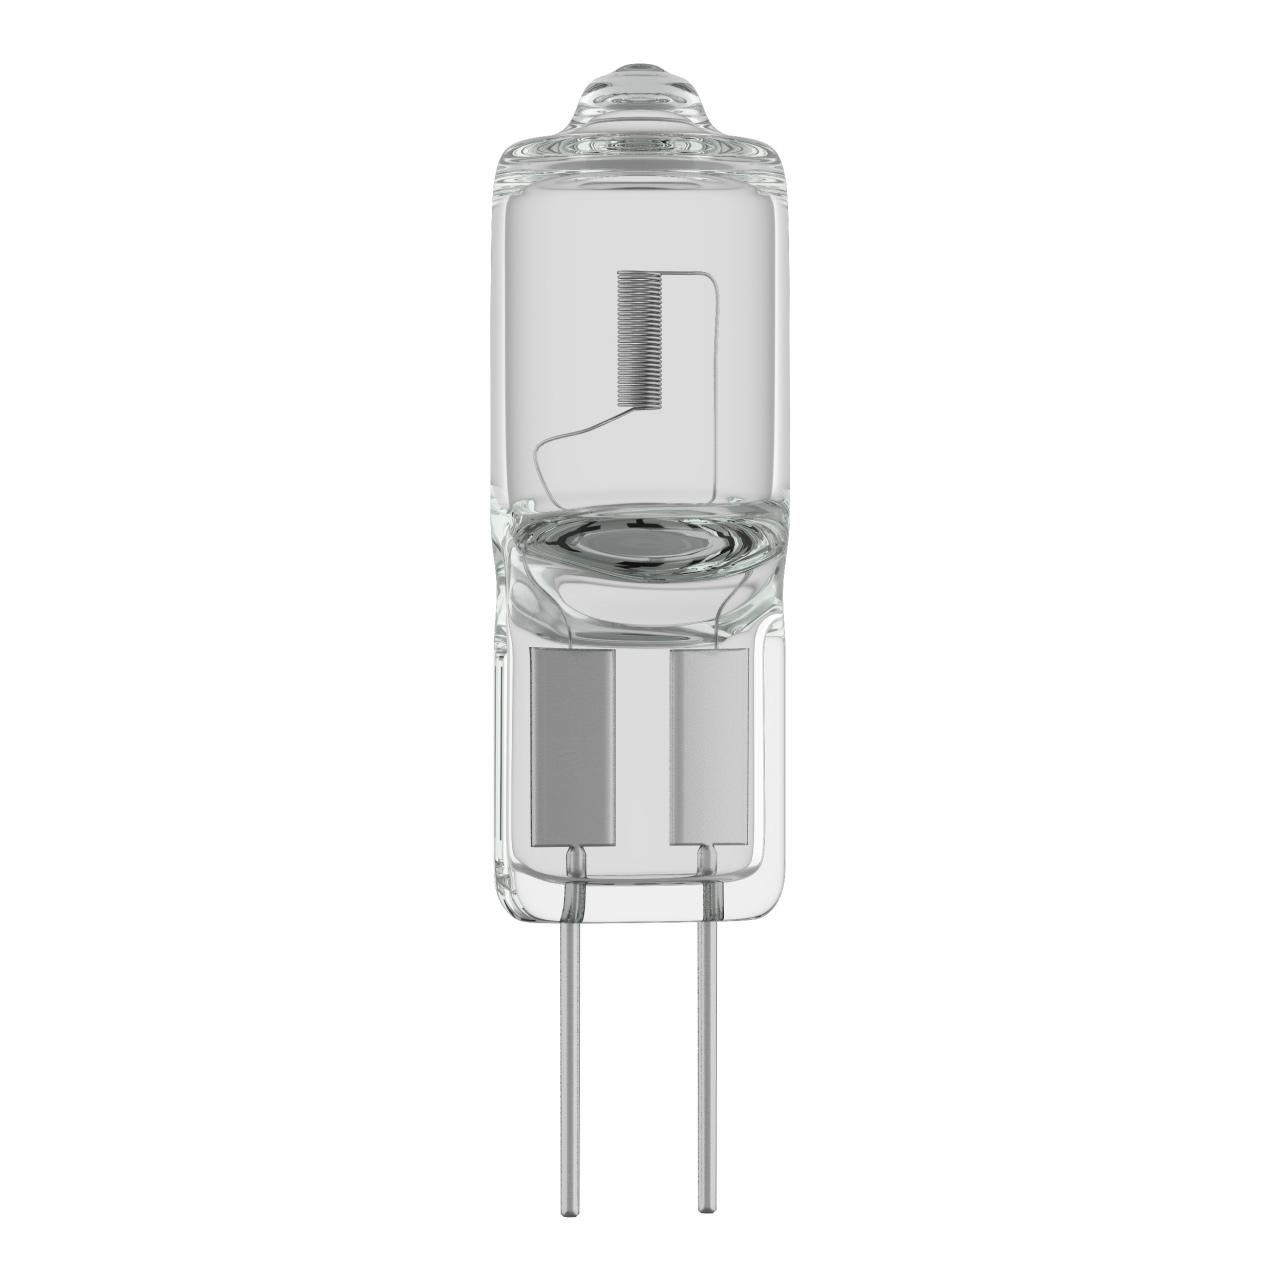 Лампа HAL 12V JC G4 35W RA100 2800K 2000H DIMM Lightstar 921023